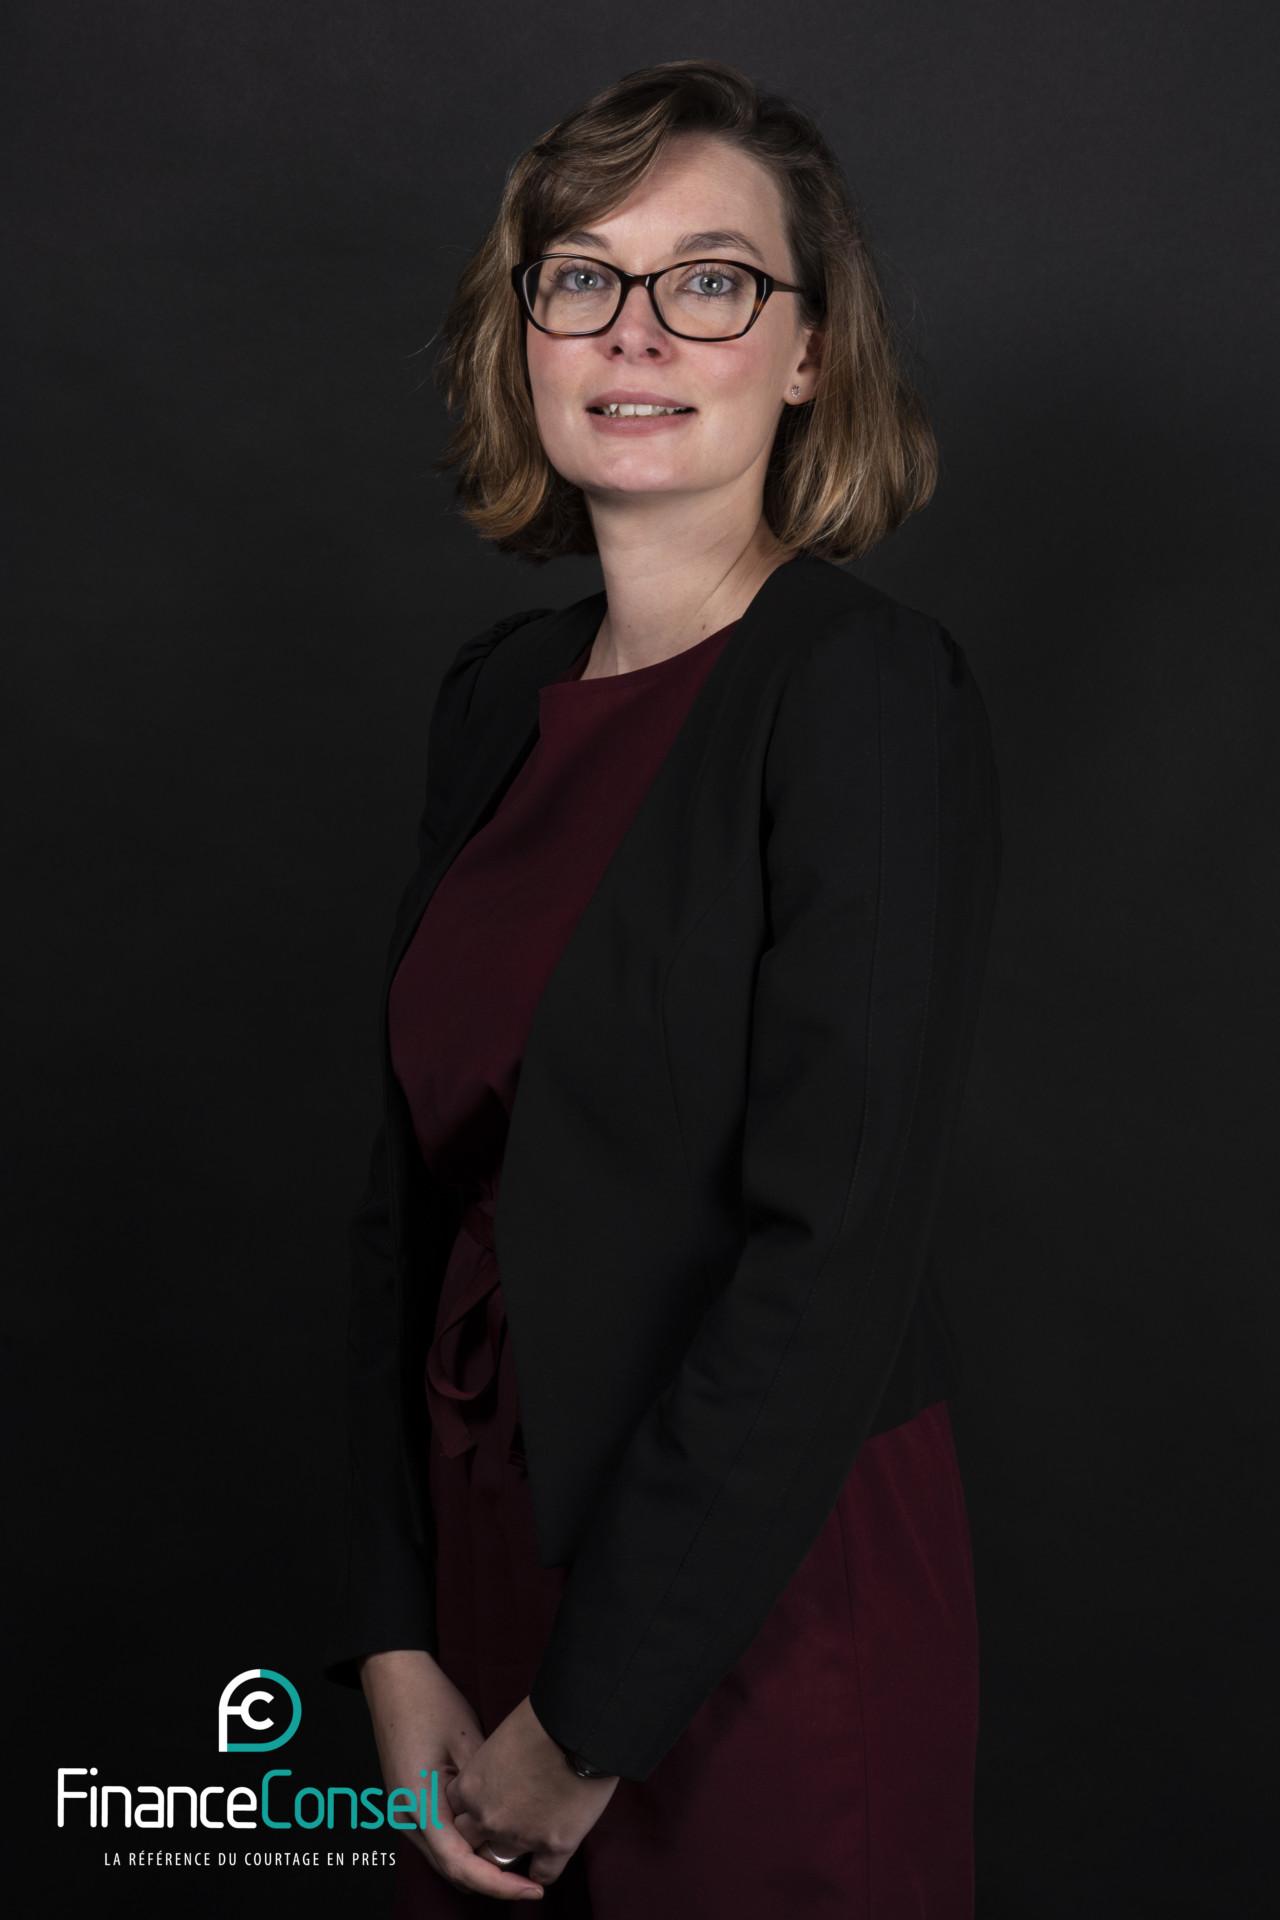 Martine HURTAUD - Assistante commerciale